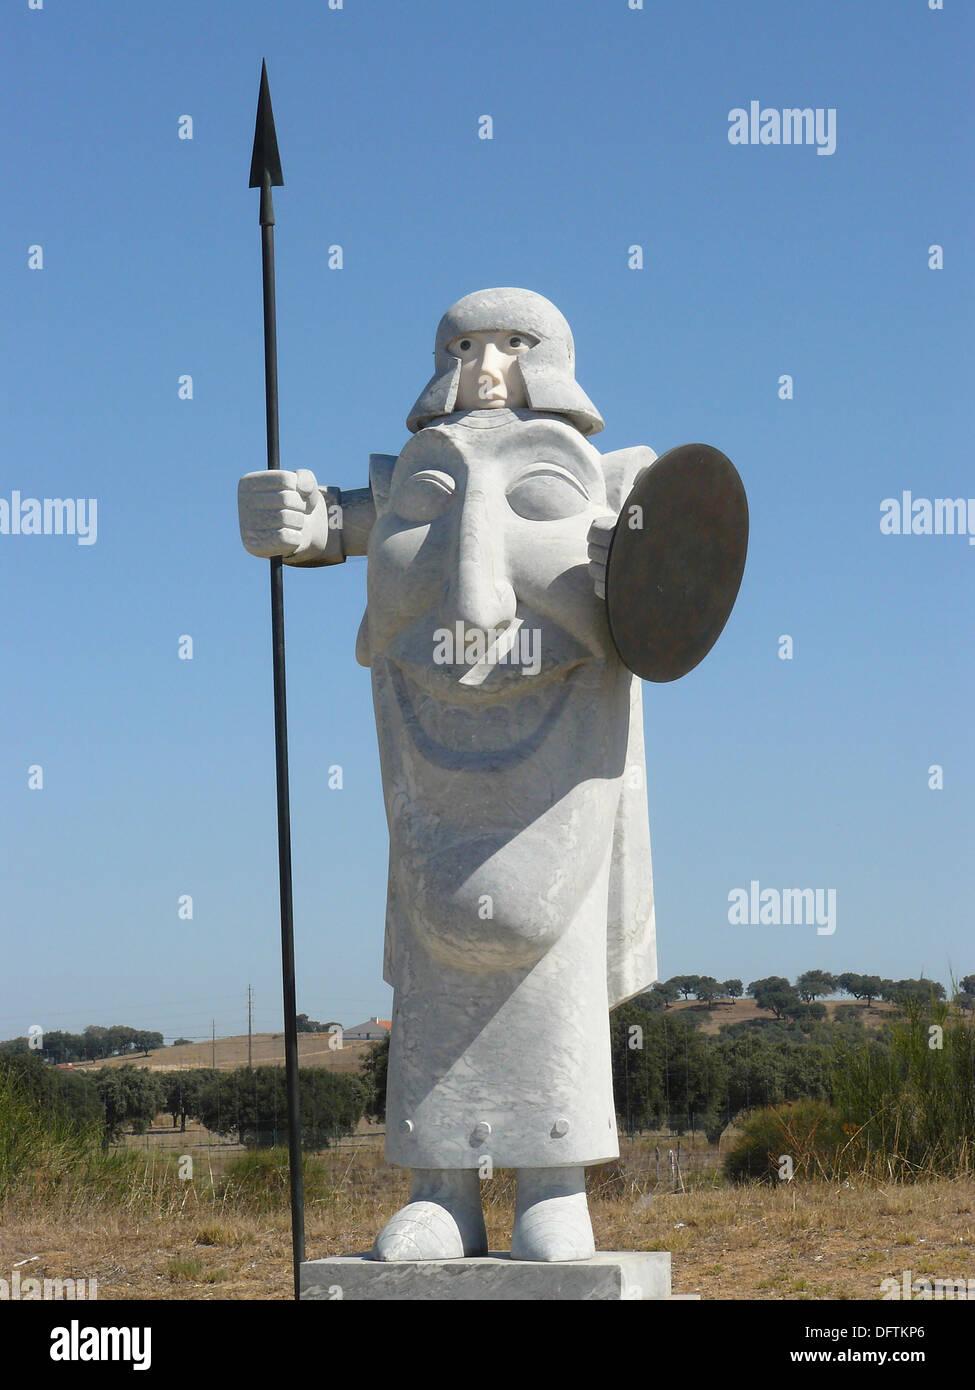 Évora Portugal  Escultura de guerrero lusitano junto a la ciudad de Évora  Lusitanian warrior sculpture near the city of Évora - Stock Image